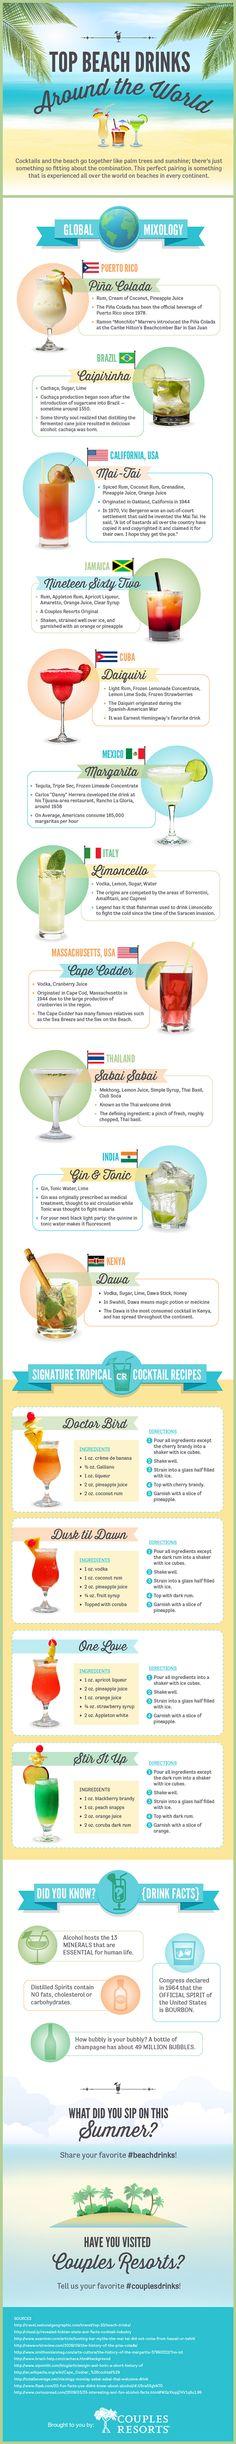 Top Beach Drinks Around the World on Behance for Couples Resort via IMI by #dezinegirl creative studio 7/14